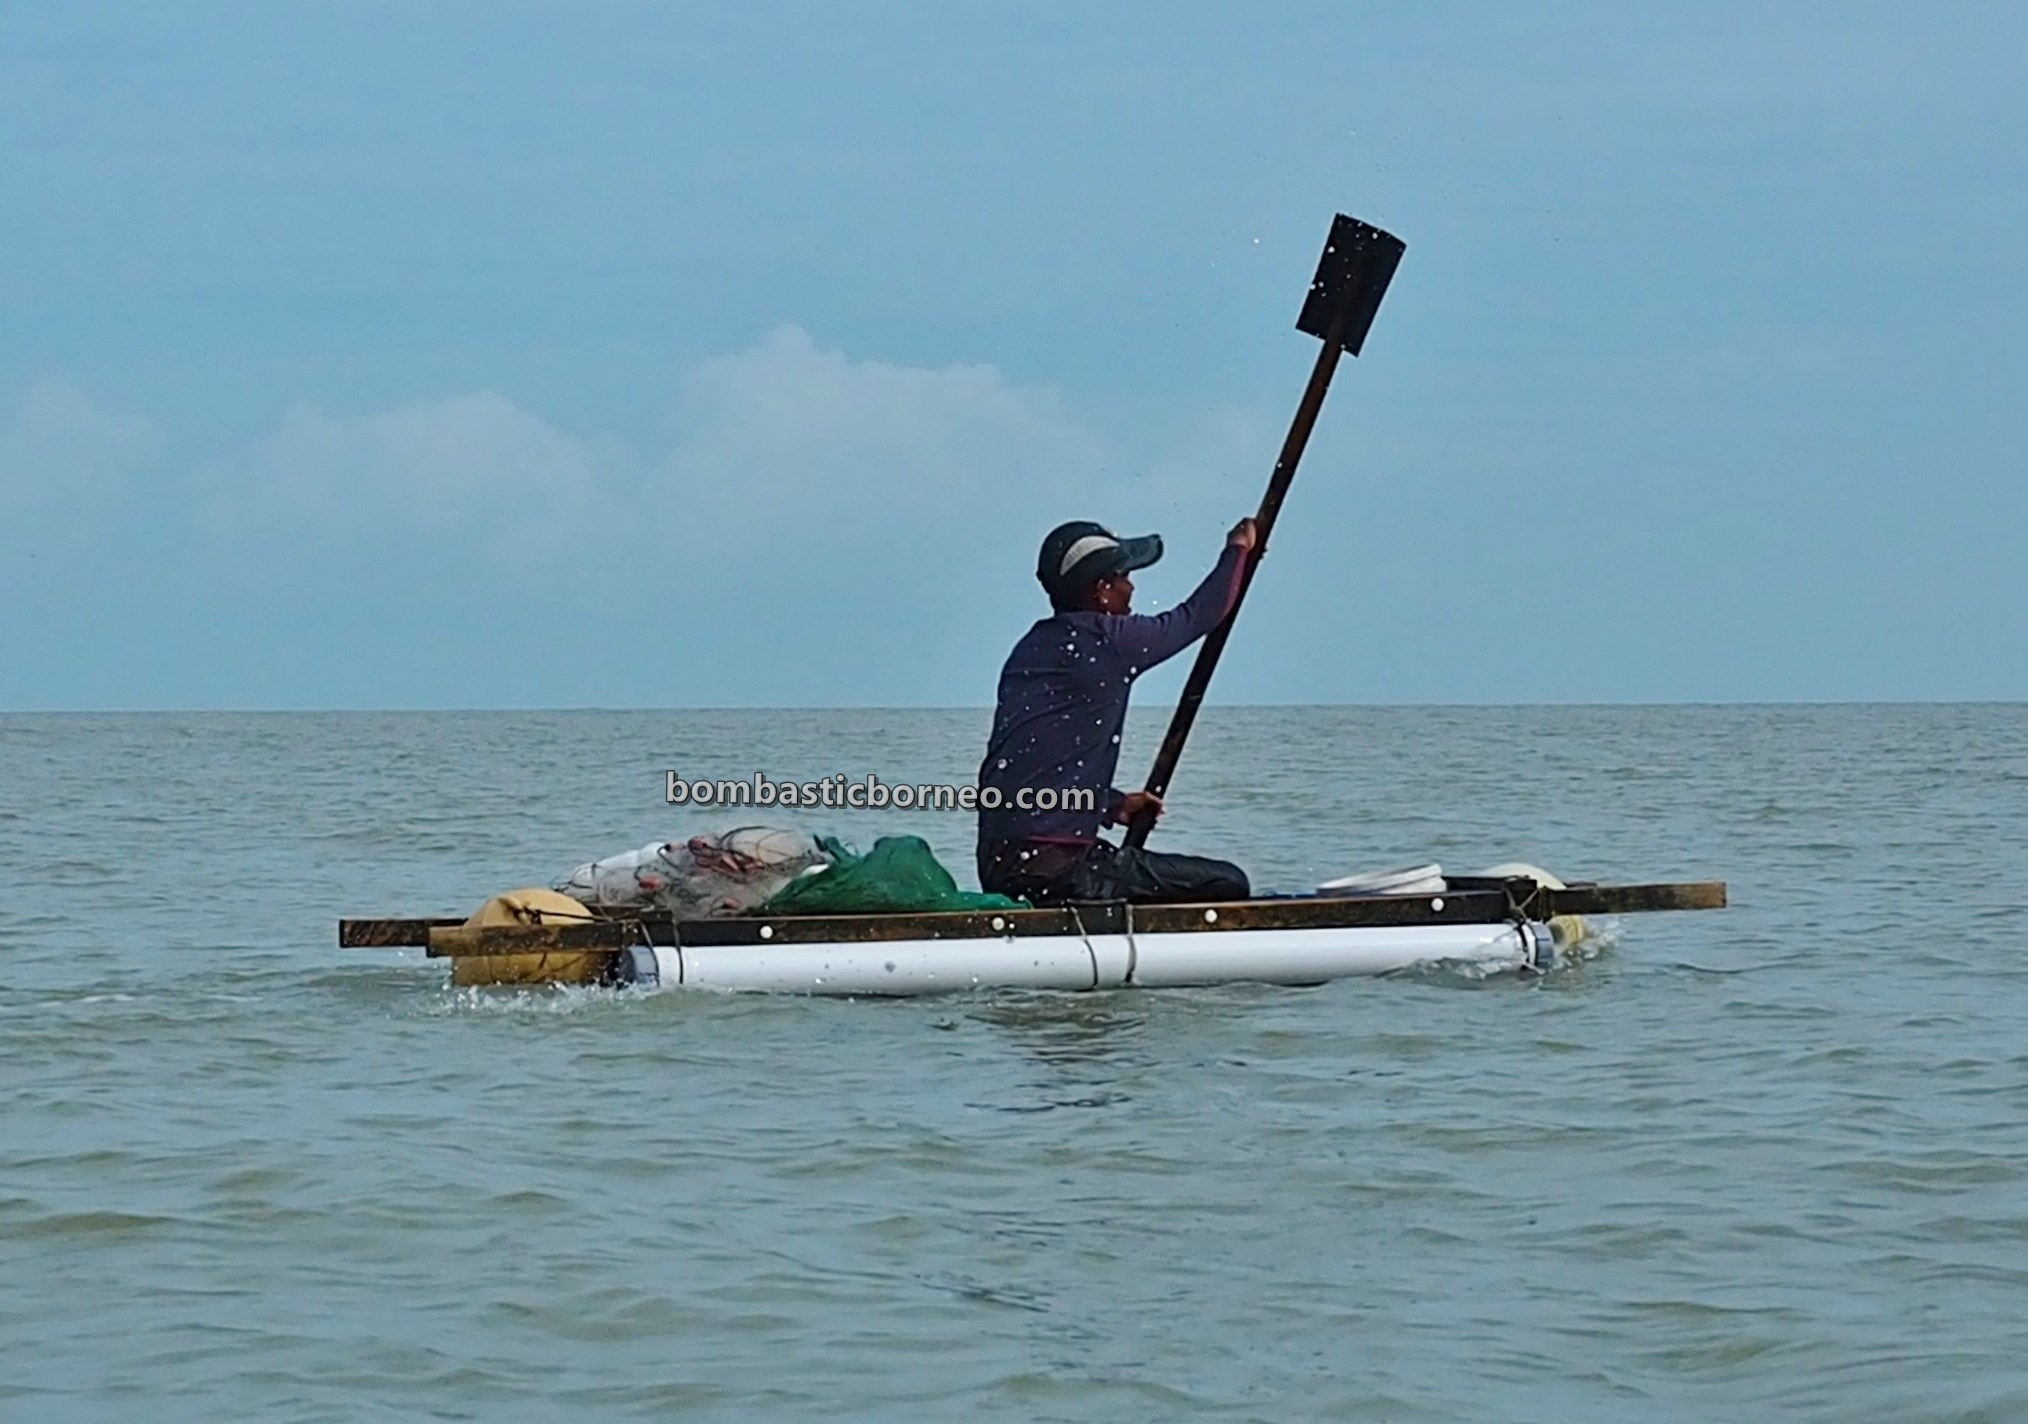 Pulau Belacan, island, seafood, Kerang, mussel, adventure, Kampung Nelayan Melayu, Kalimantan Barat, Jawai Laut, tourist attraction, travel guide, 跨境婆罗洲游踪, 印尼西加里曼丹, 三发马来渔村